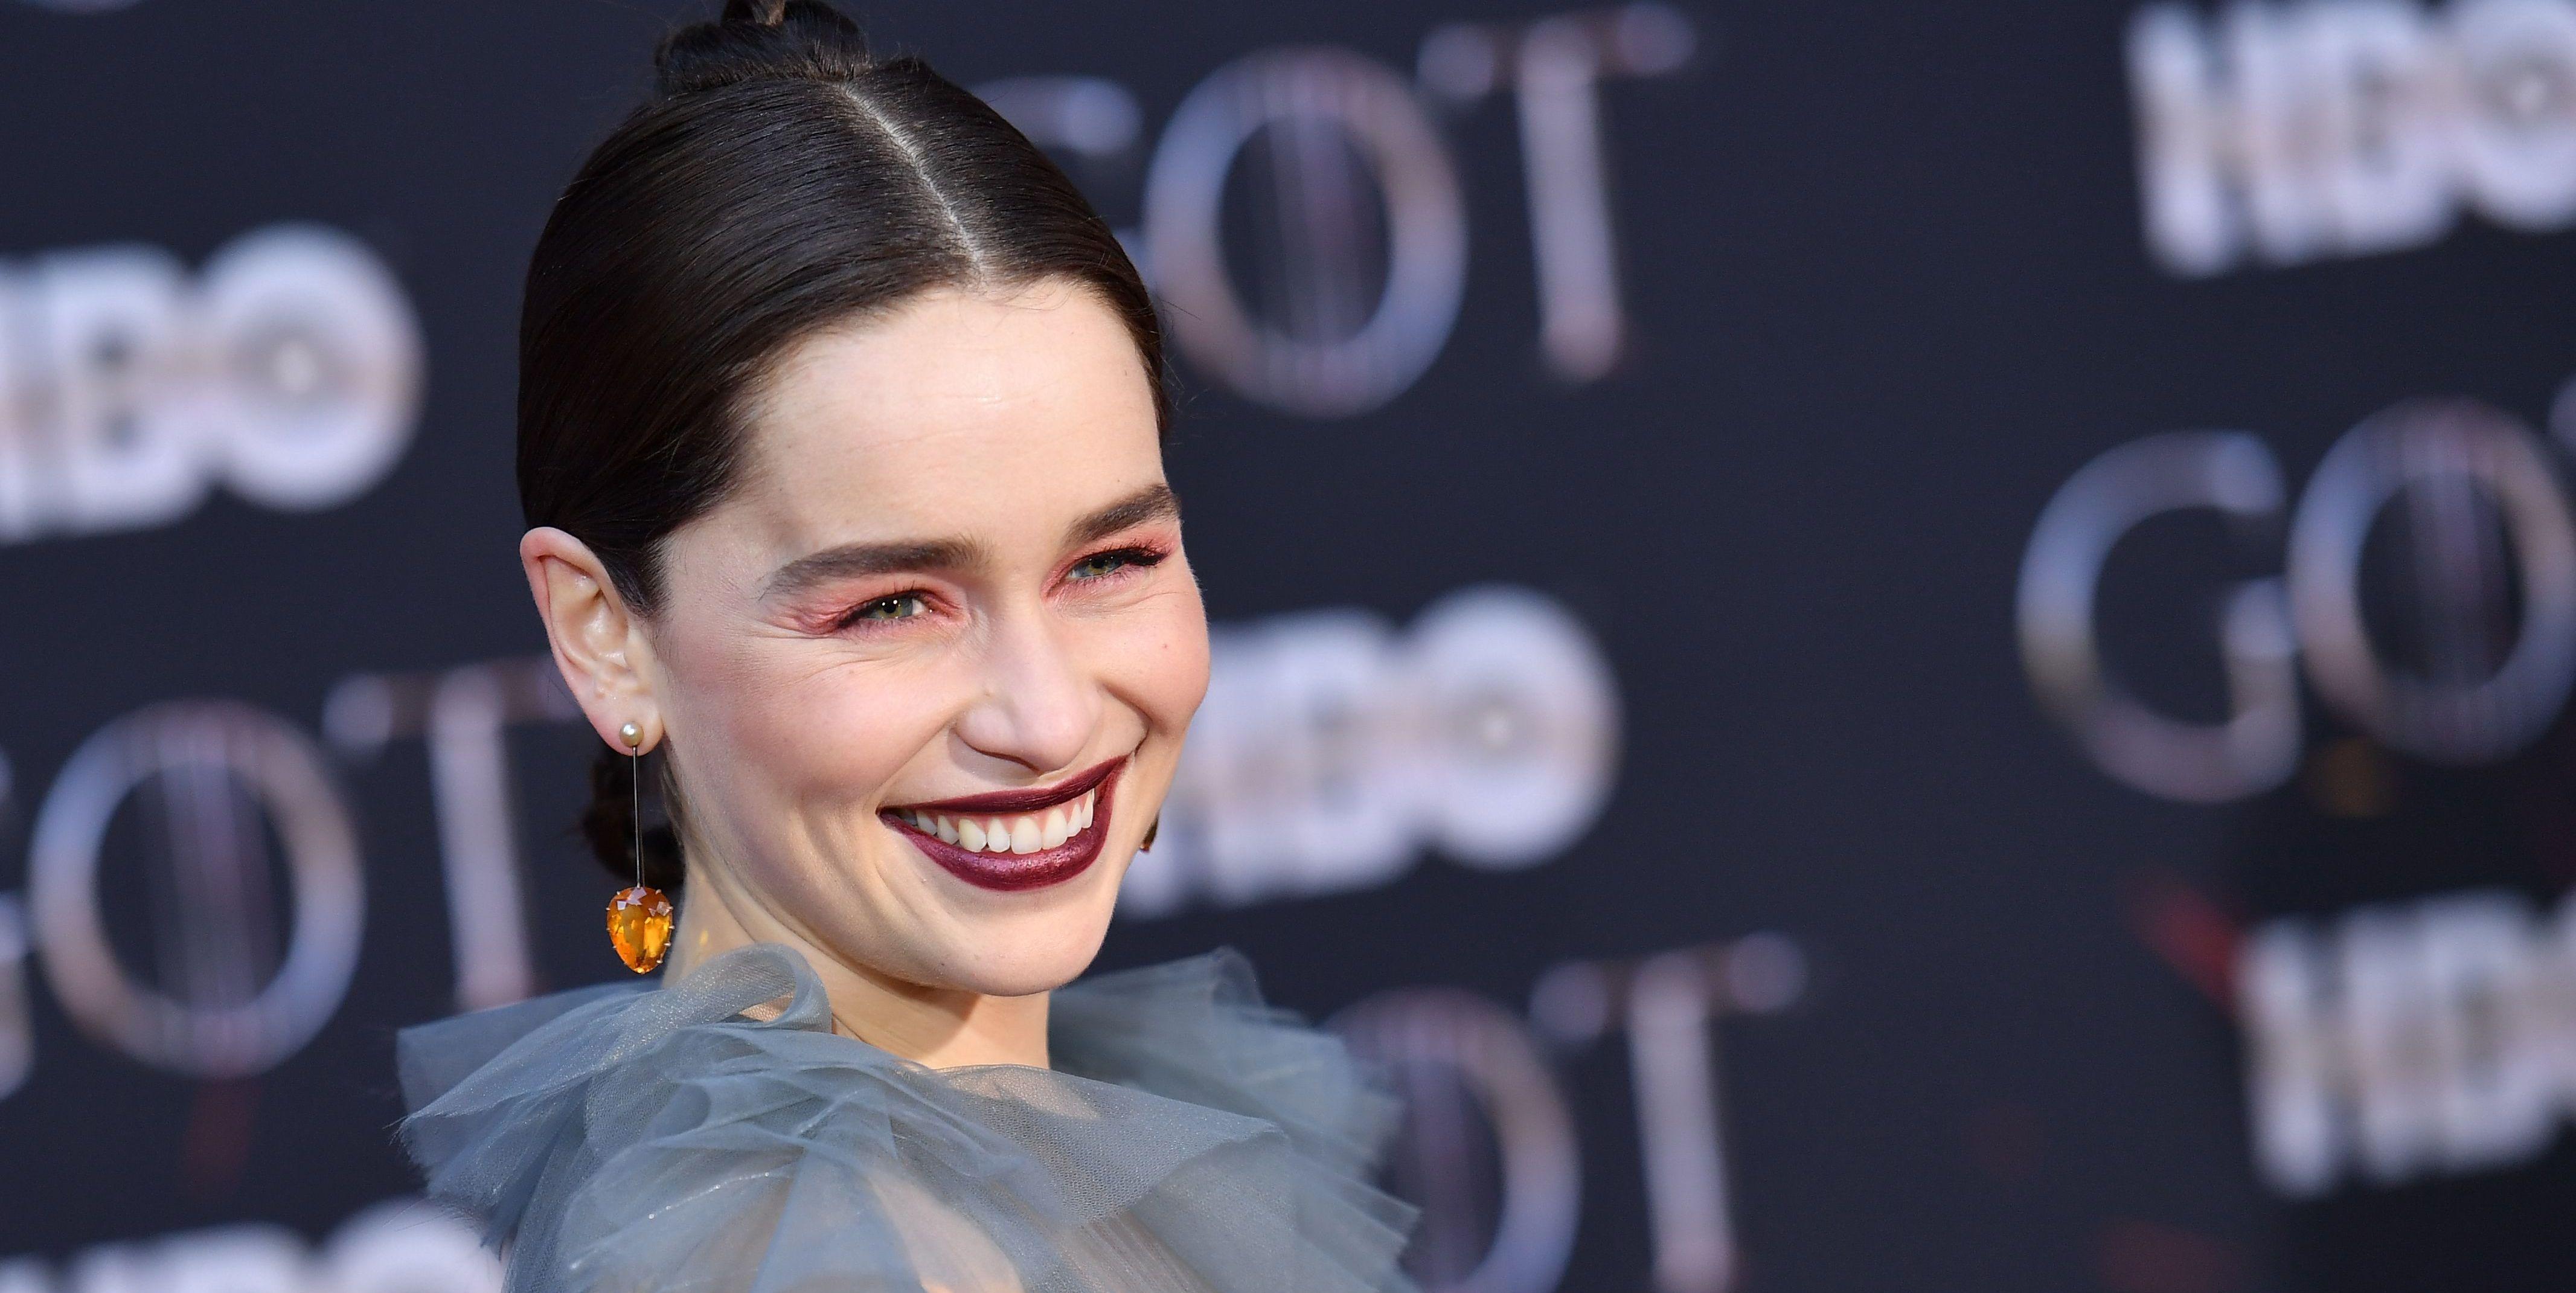 Emilia Clarke game of thrones premiere in valentino dress